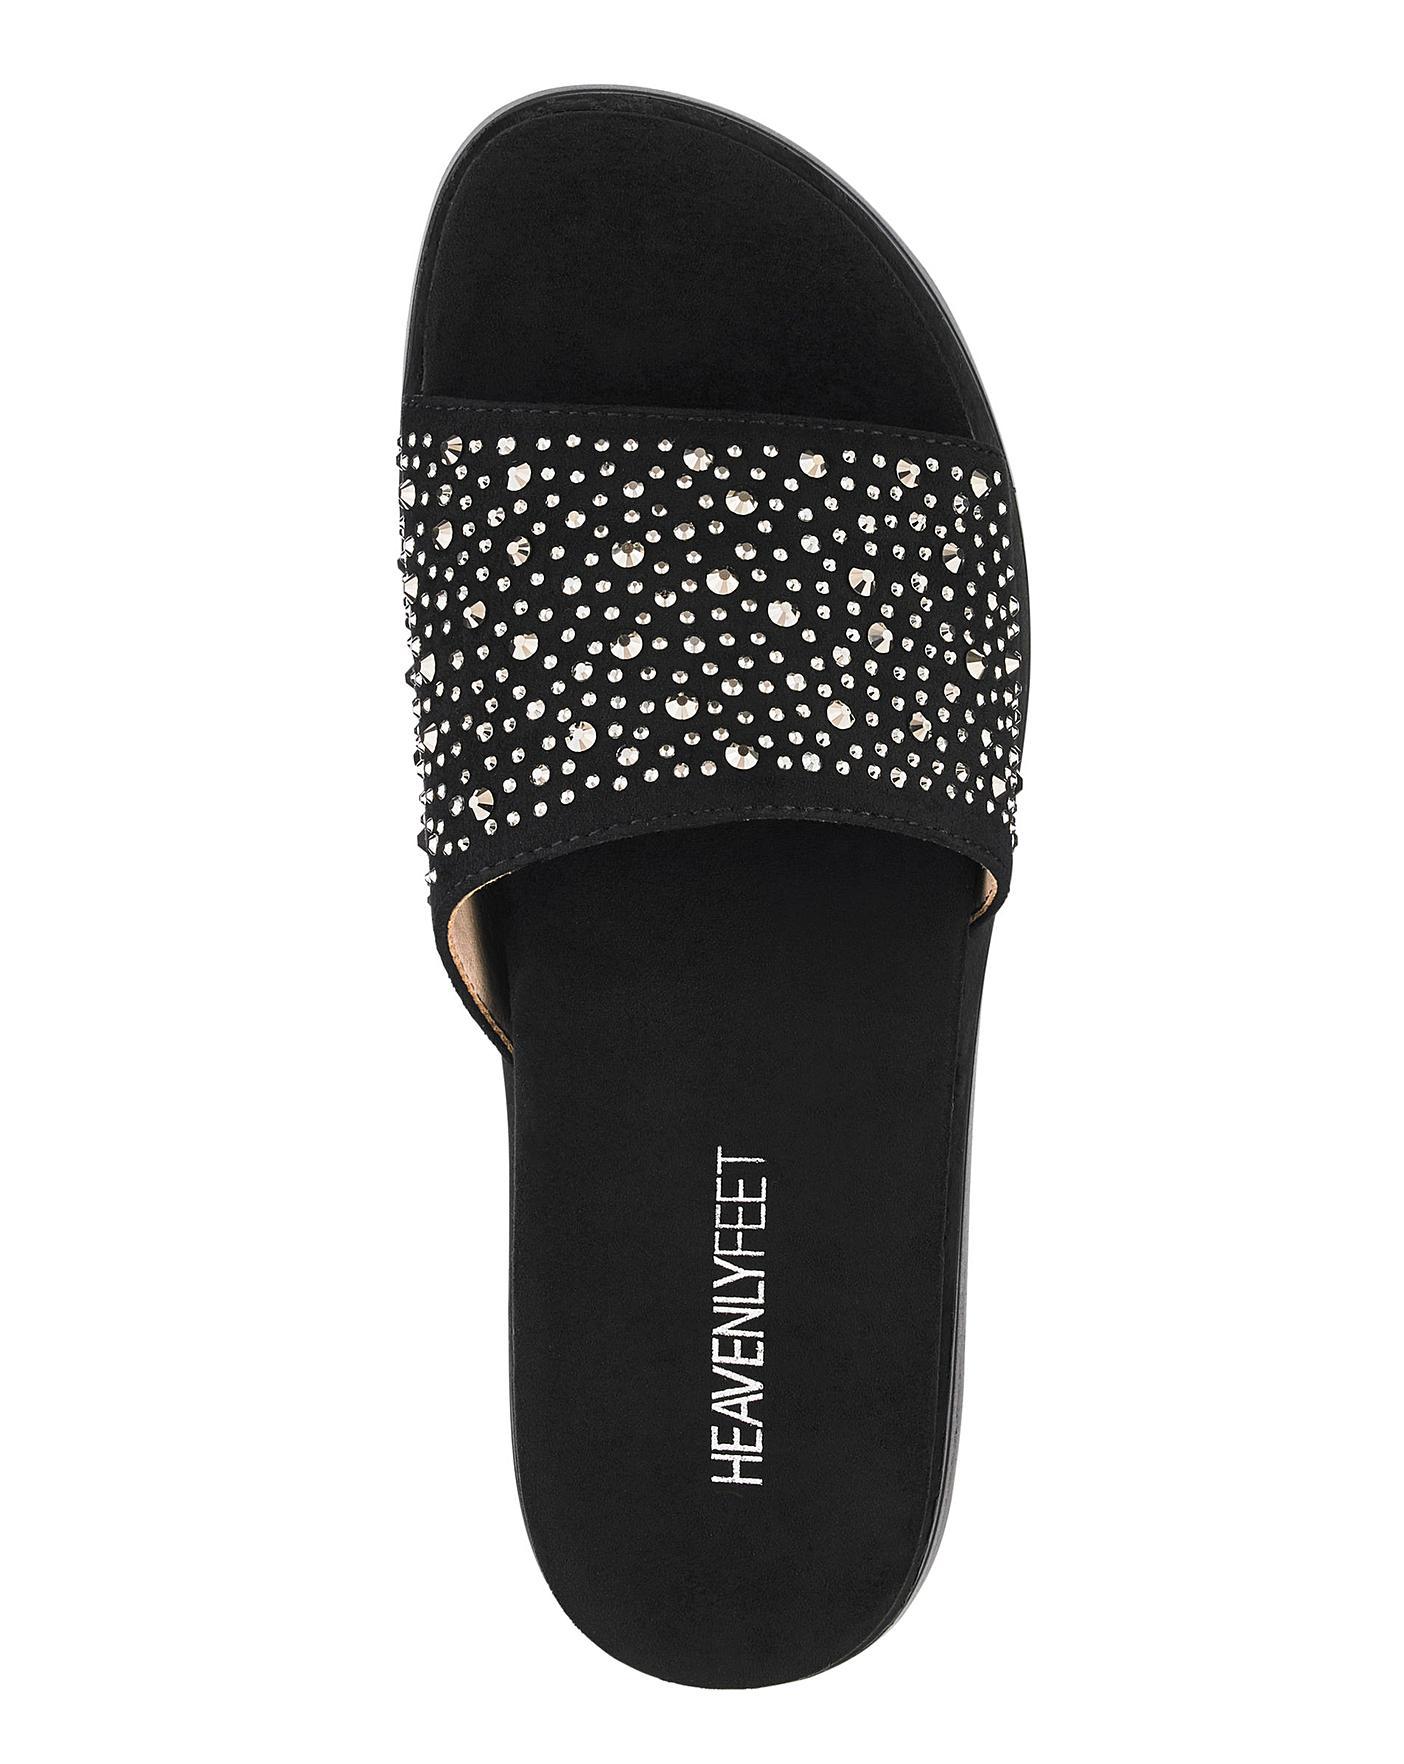 Heavenly Feet Mule Sandals E Fit Fashion World